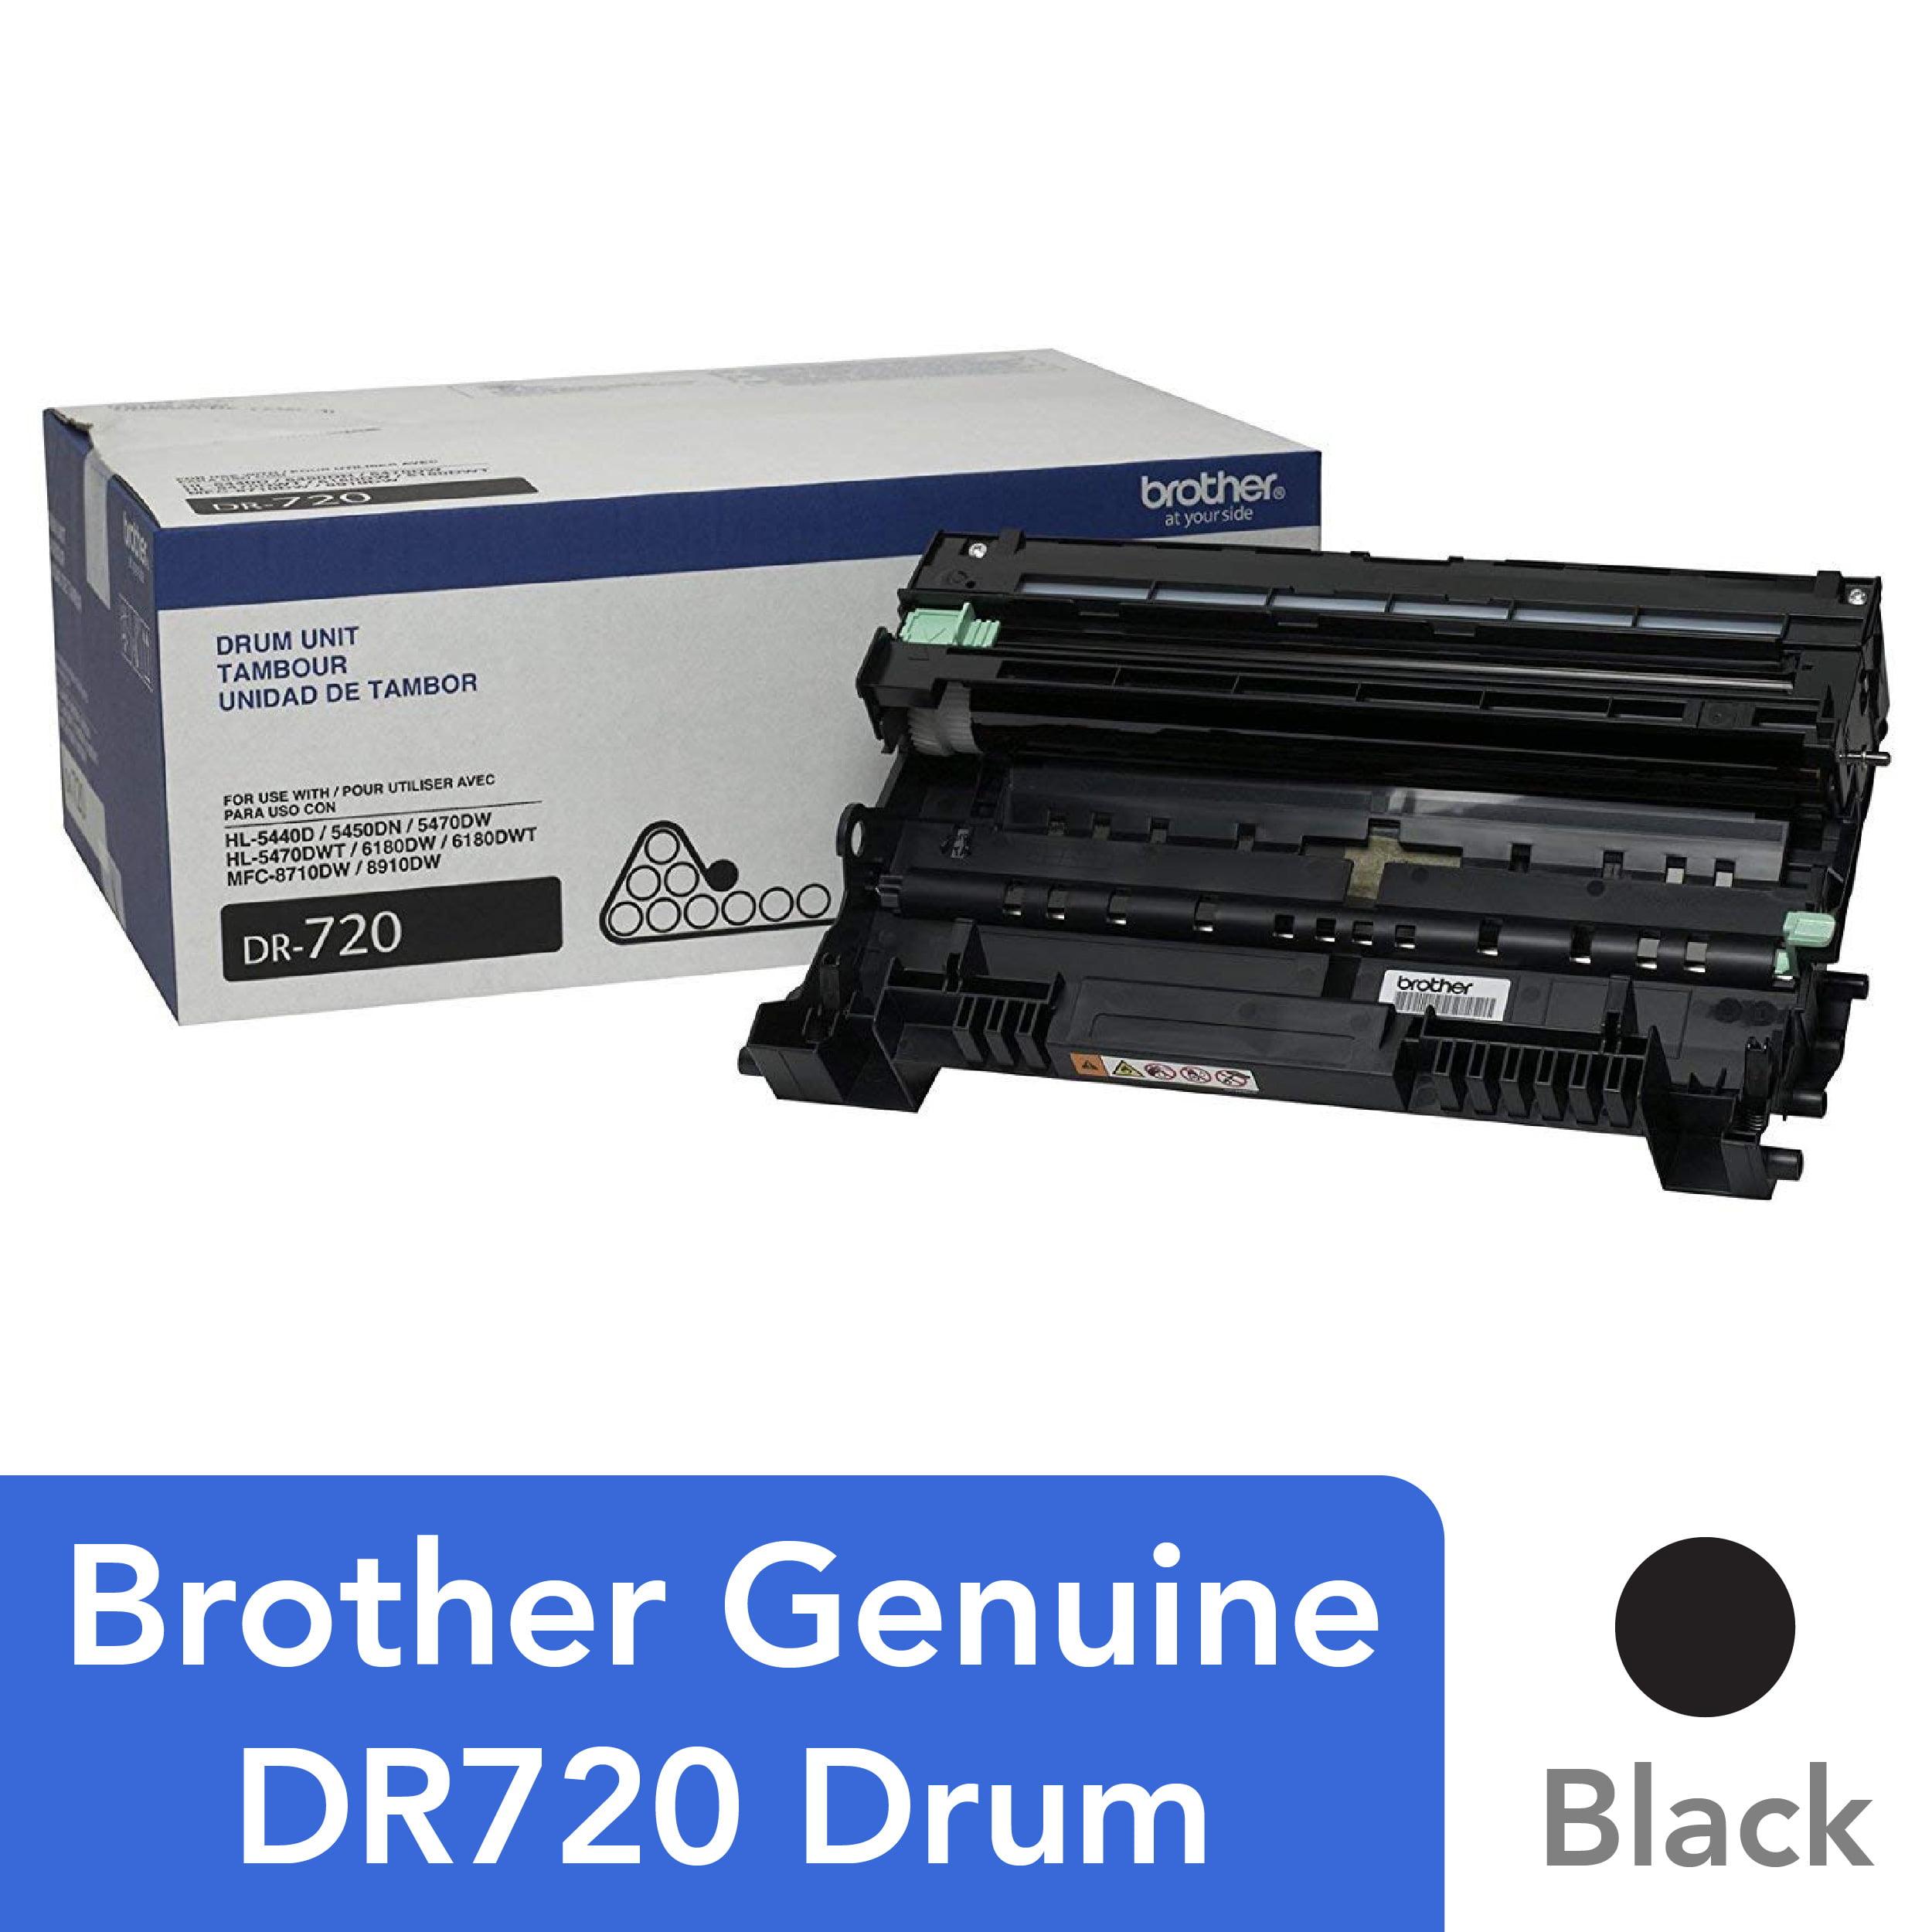 2p TN720 TN-720 BLACK Printer Toner Cartridge for Brother MFC-8950DW MFC-8950DWT